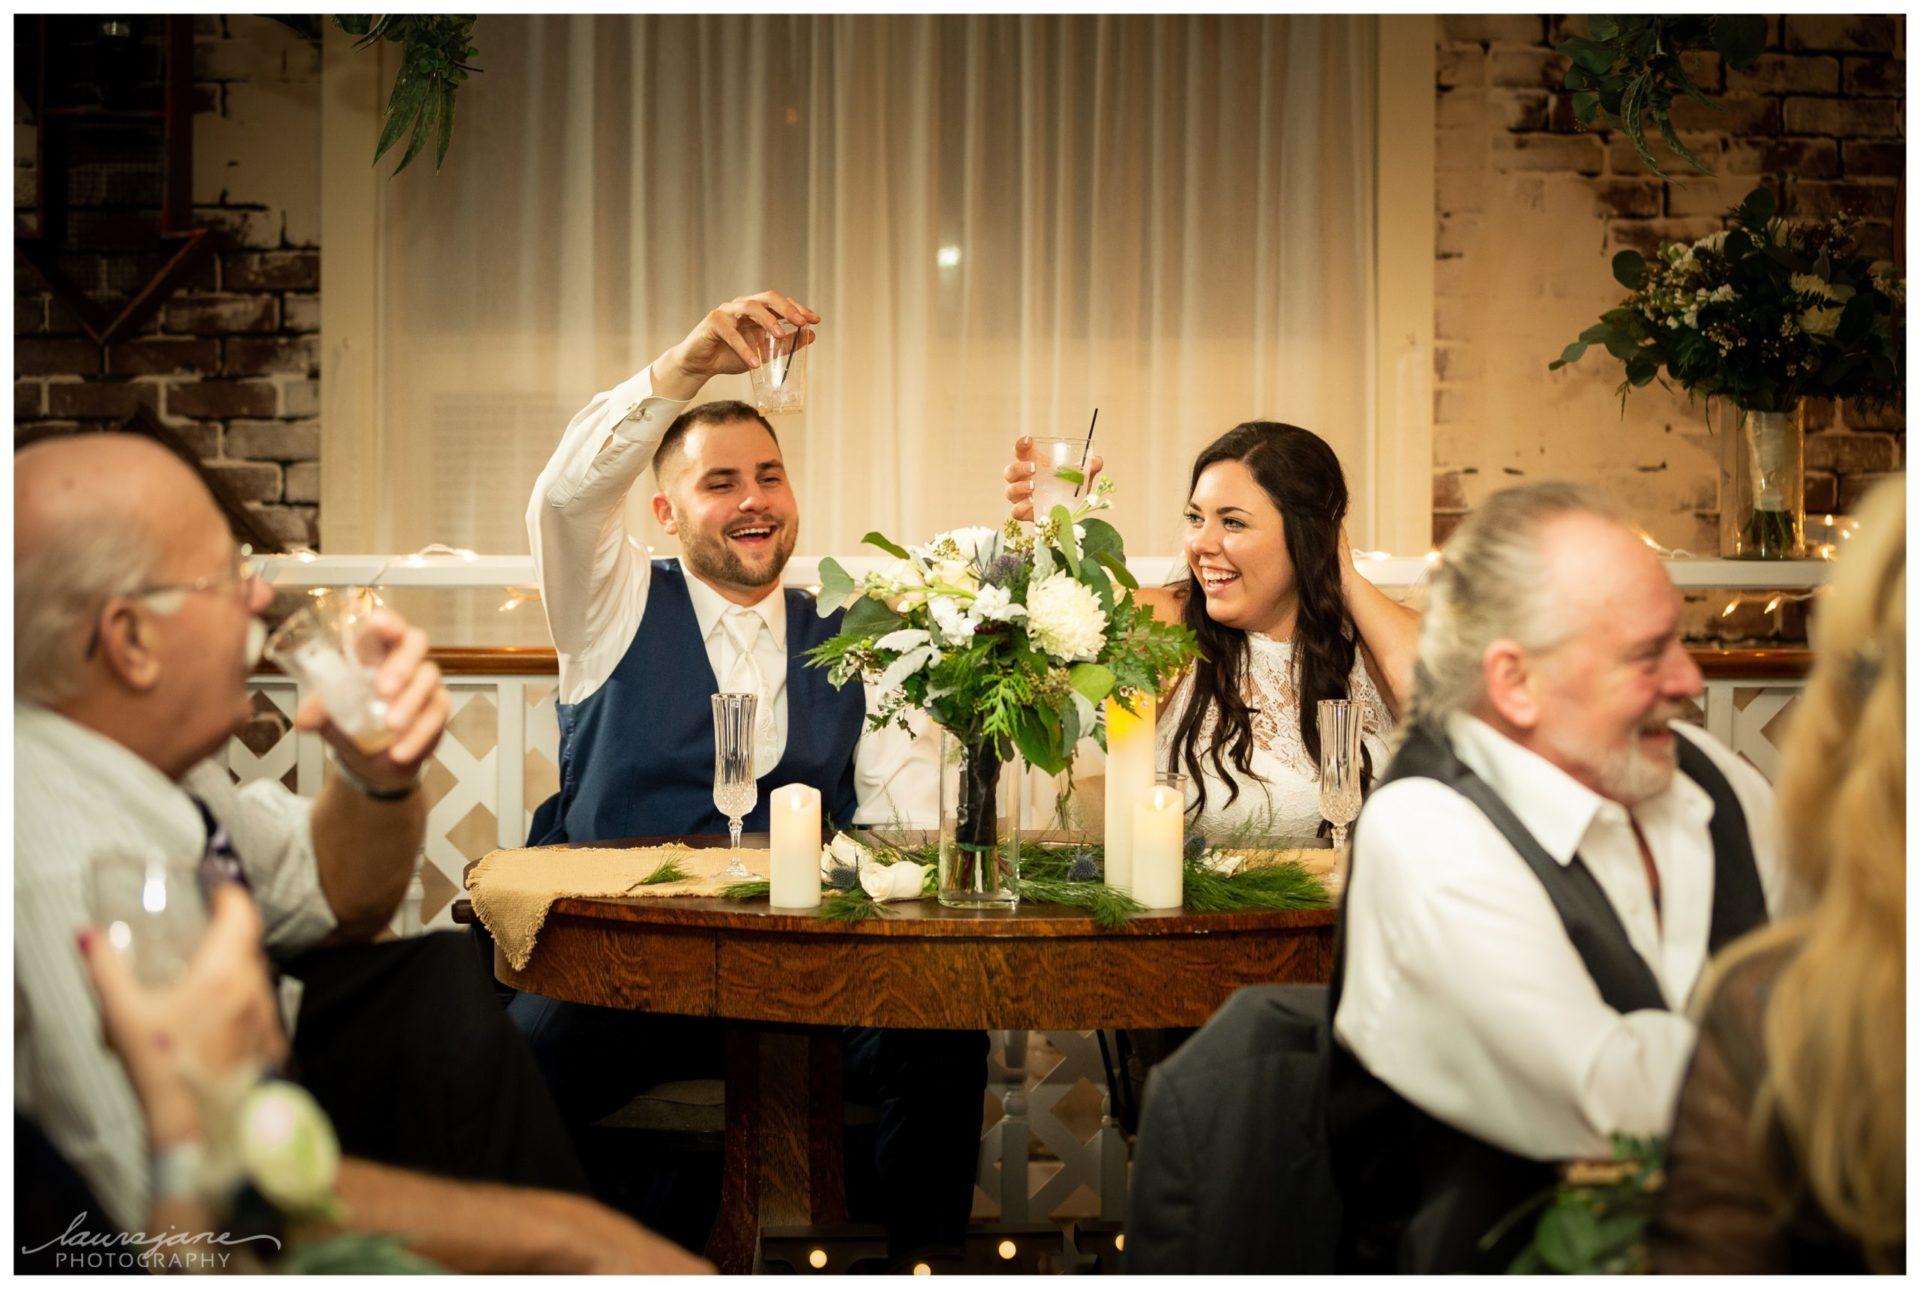 Candid Reception Photos at Wisconsin Wedding